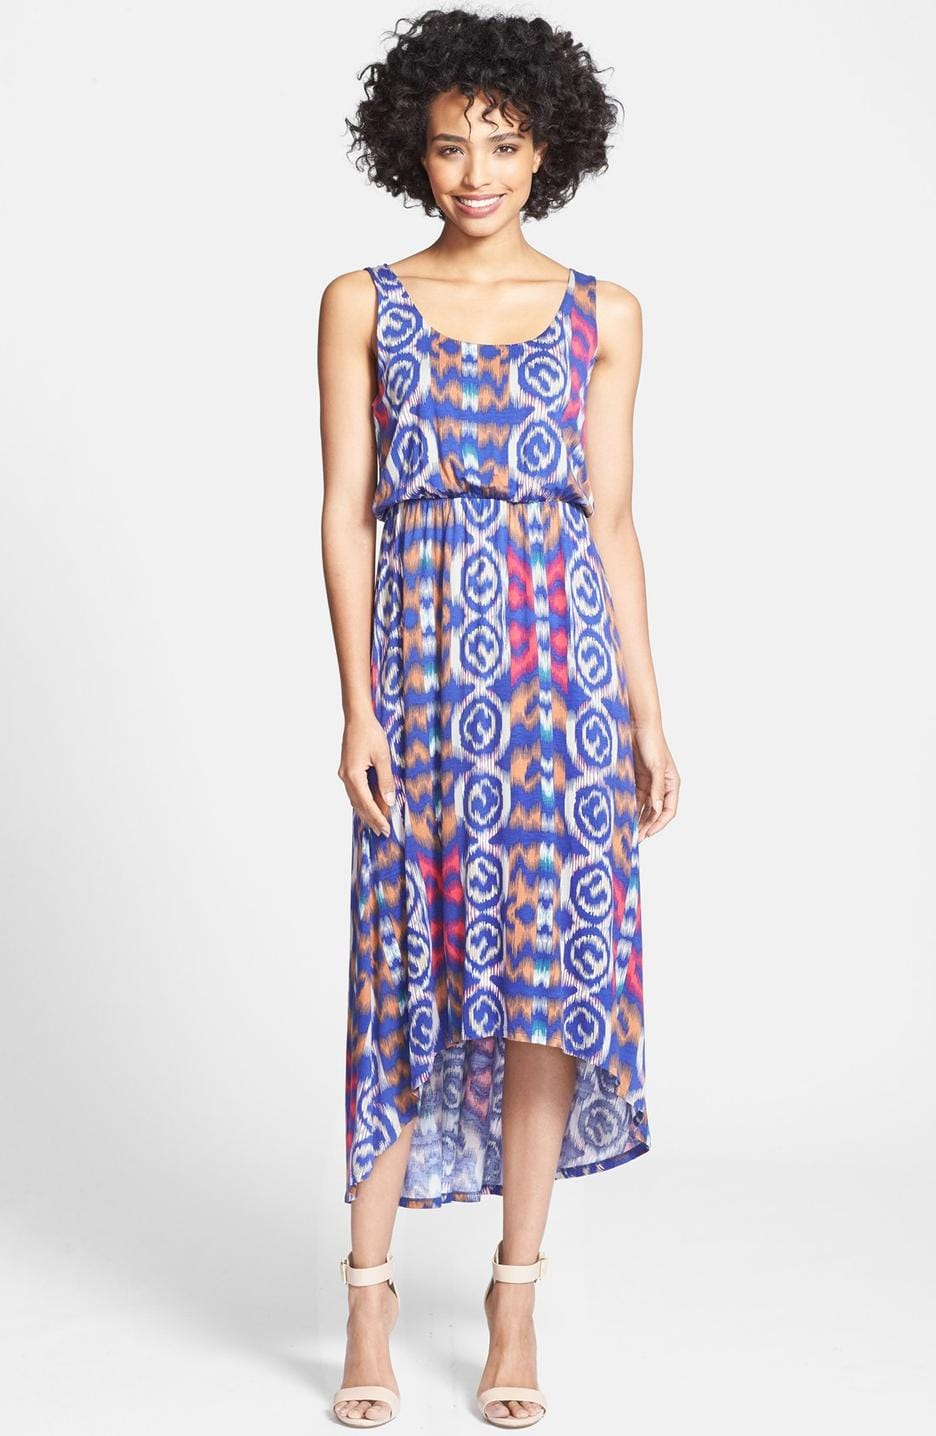 summer-dress-40-age-05